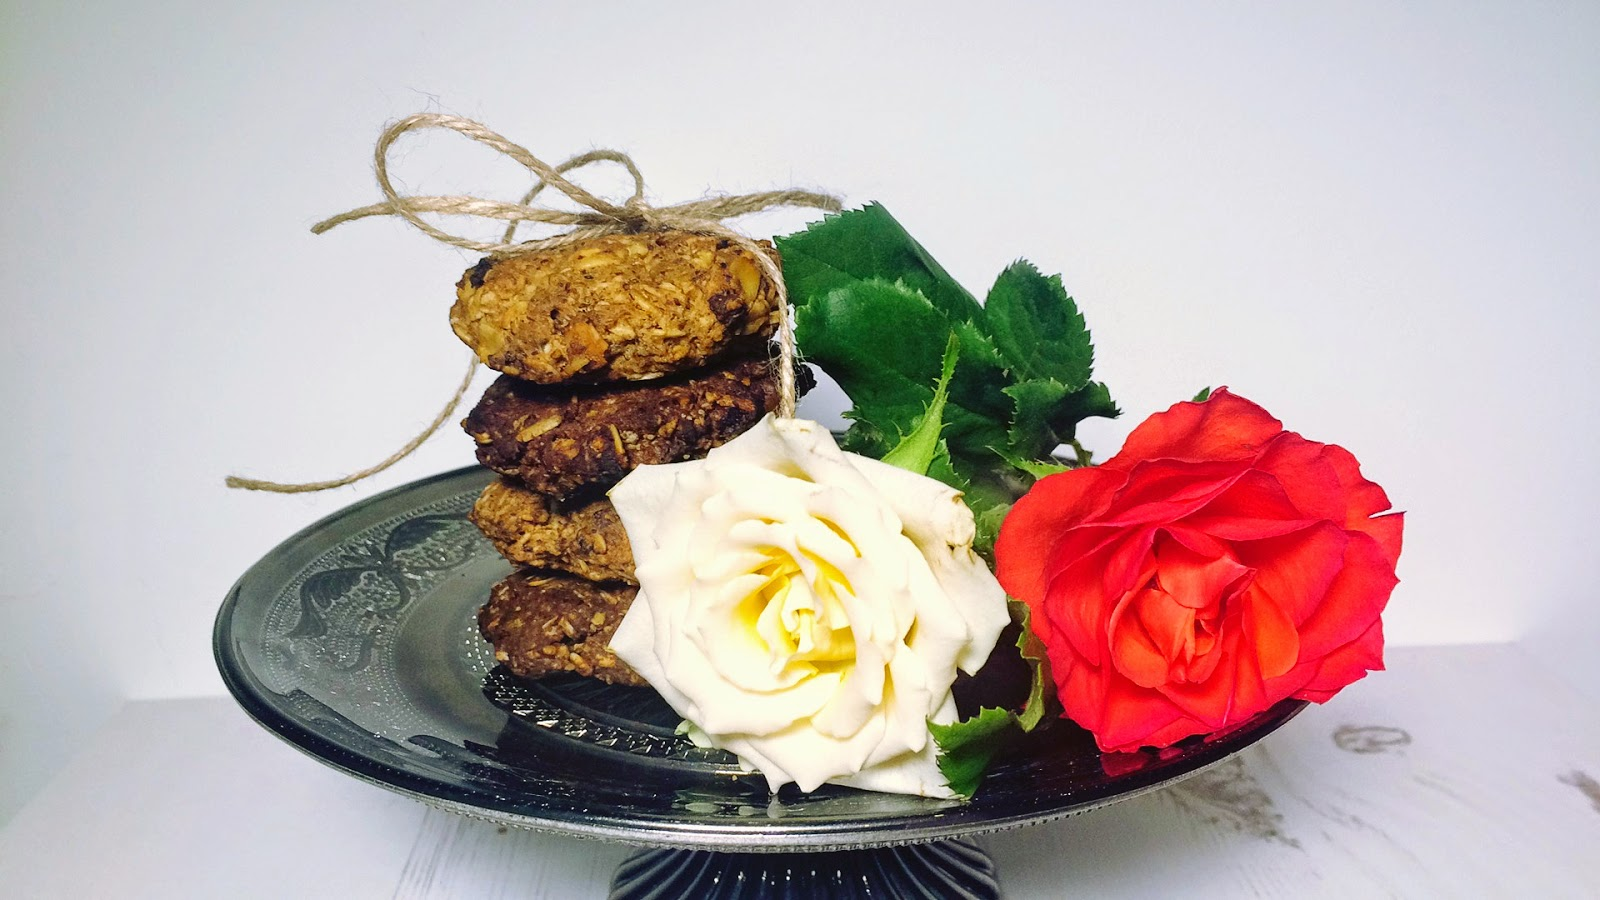 Oatmeal cookies / Ciasteczka owsiane bezglutenowe ciastka cookies owsiane weganskie vegan